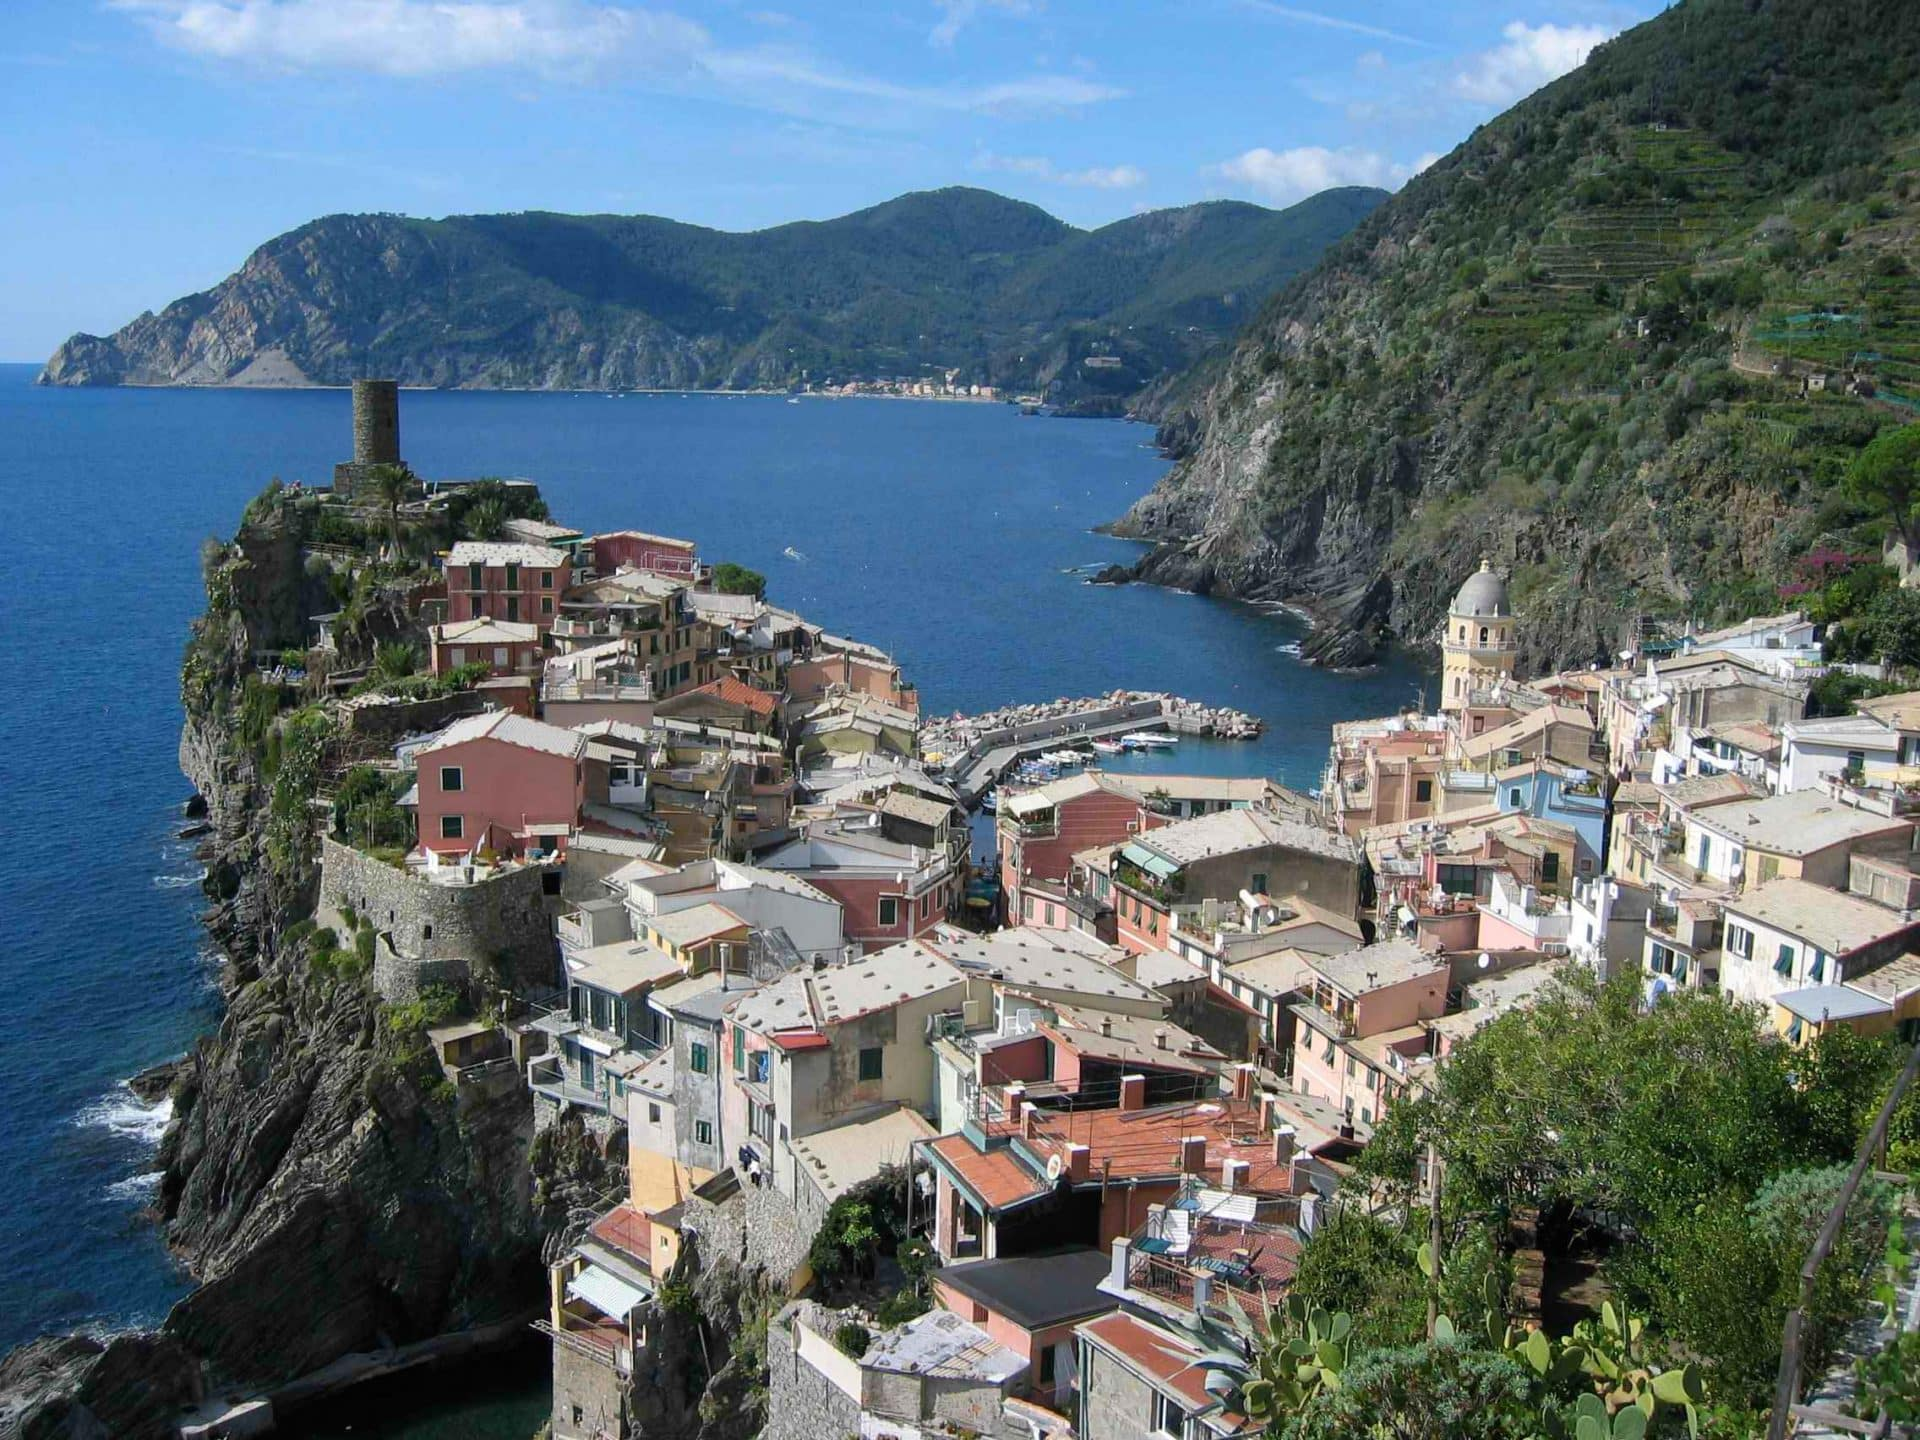 The Heart Of Cinque Terre cinque terre 3-day hiking tour, with portofino option. 3-day